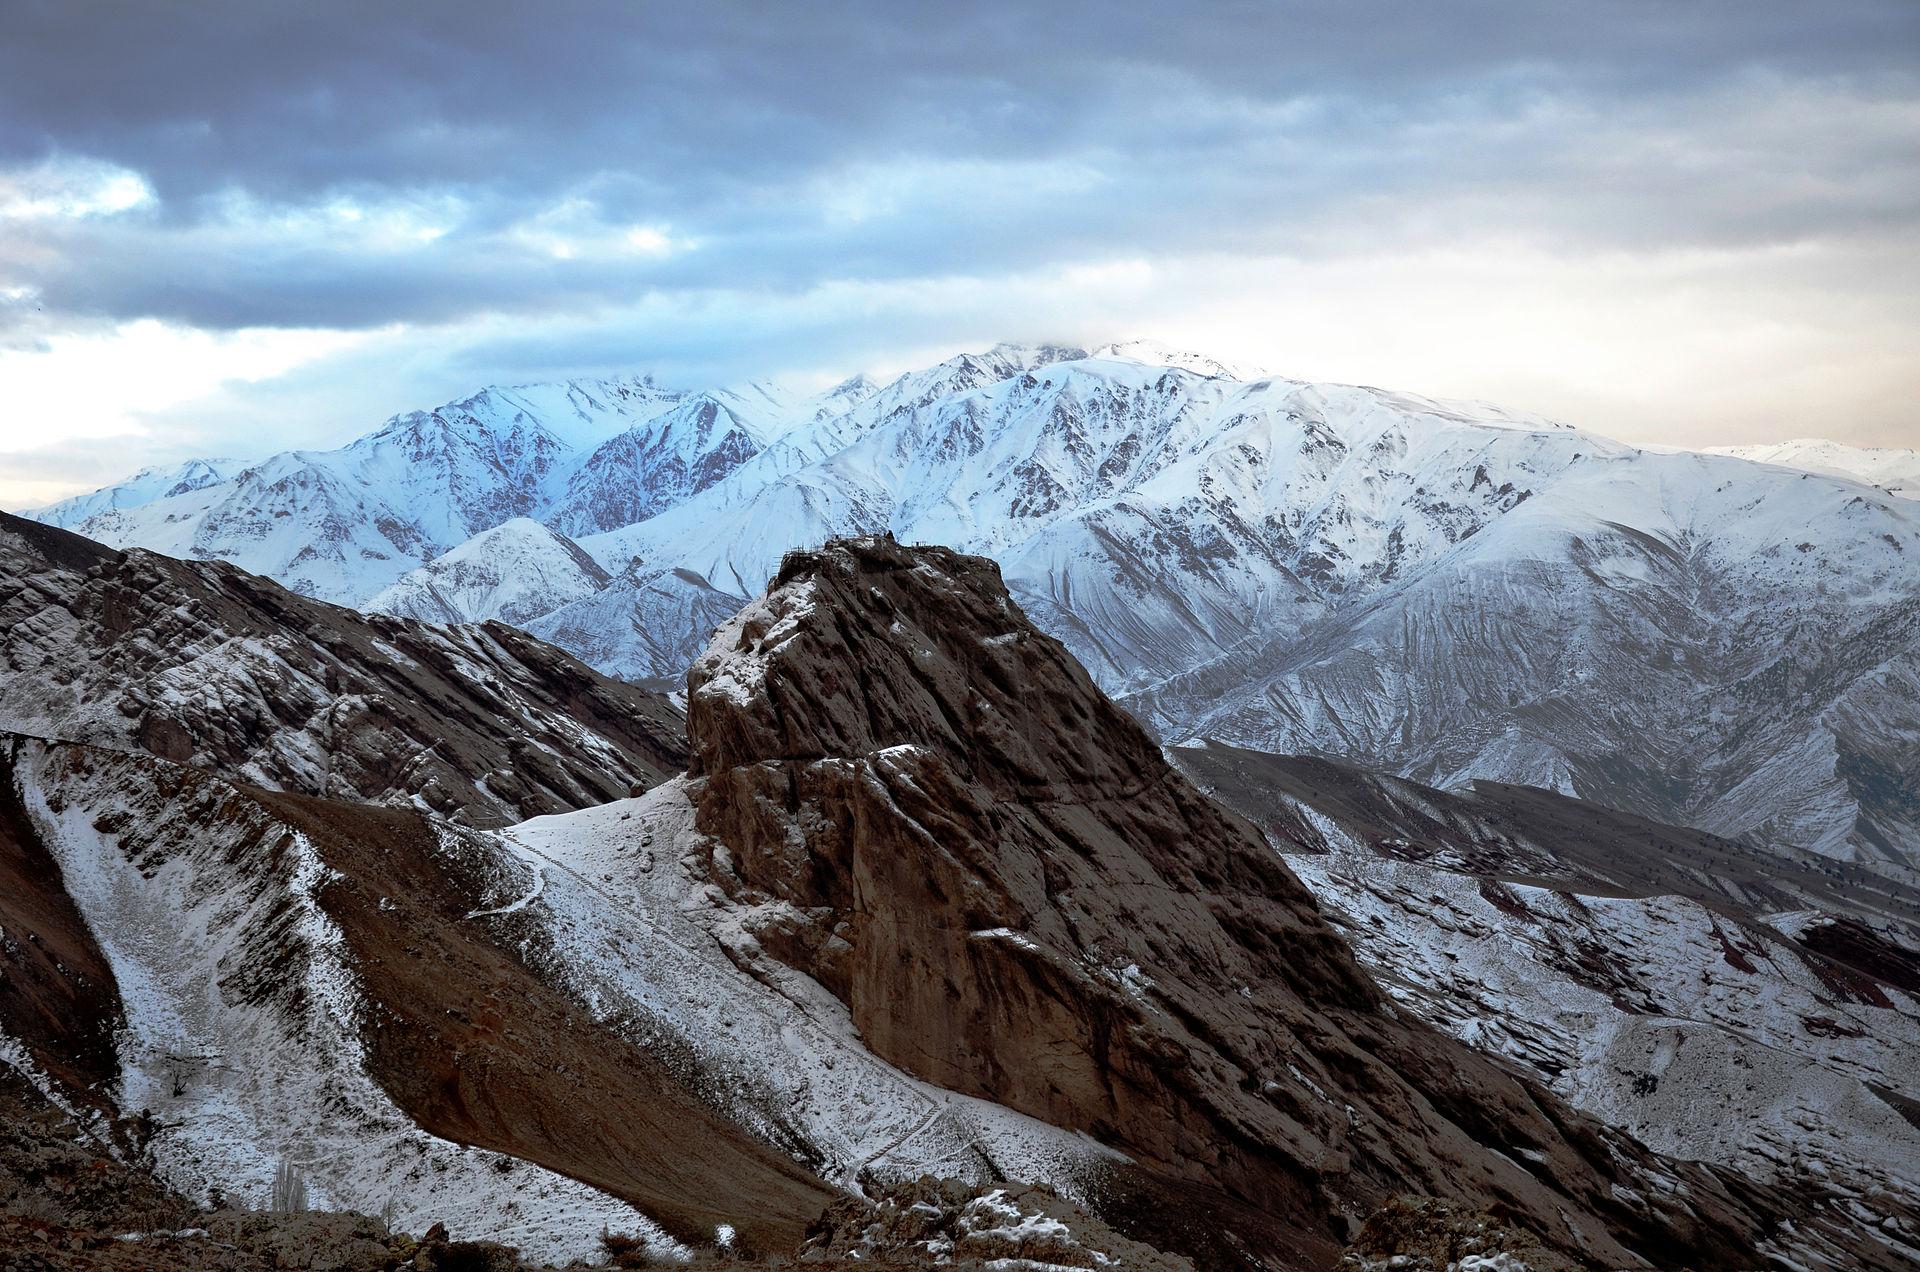 Iran_-_Qazvin_-_Alamout_Castle_View.jpg